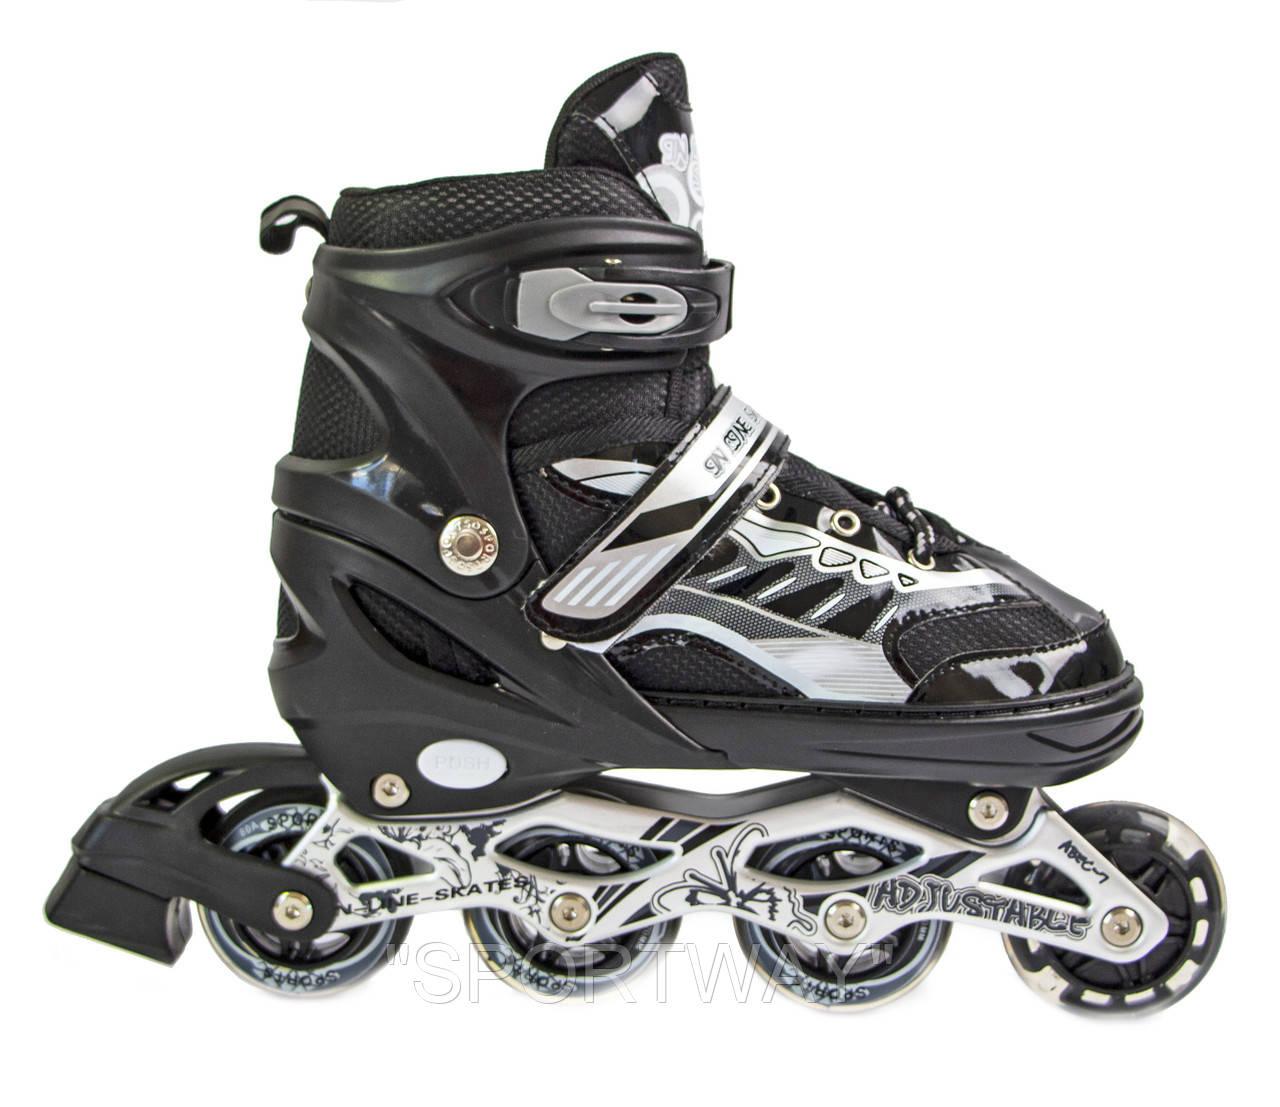 Ролики Skate Sport. Black. р.29-33,34-37,38-42.